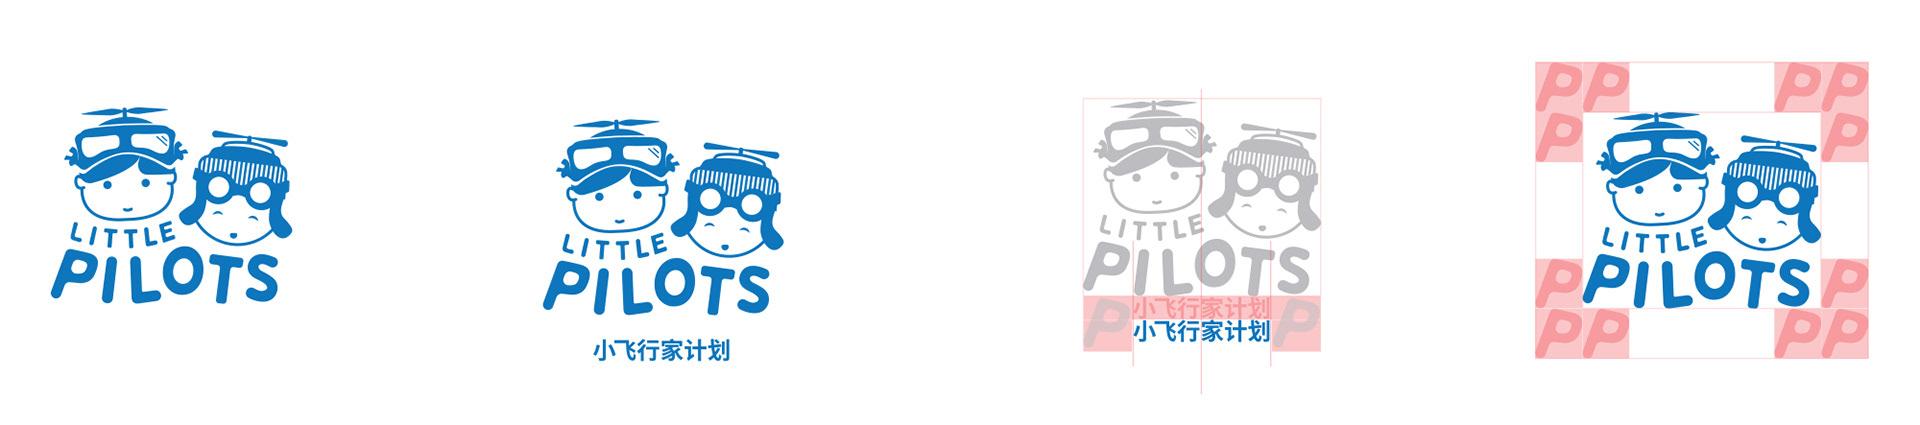 little pilots logo spacing